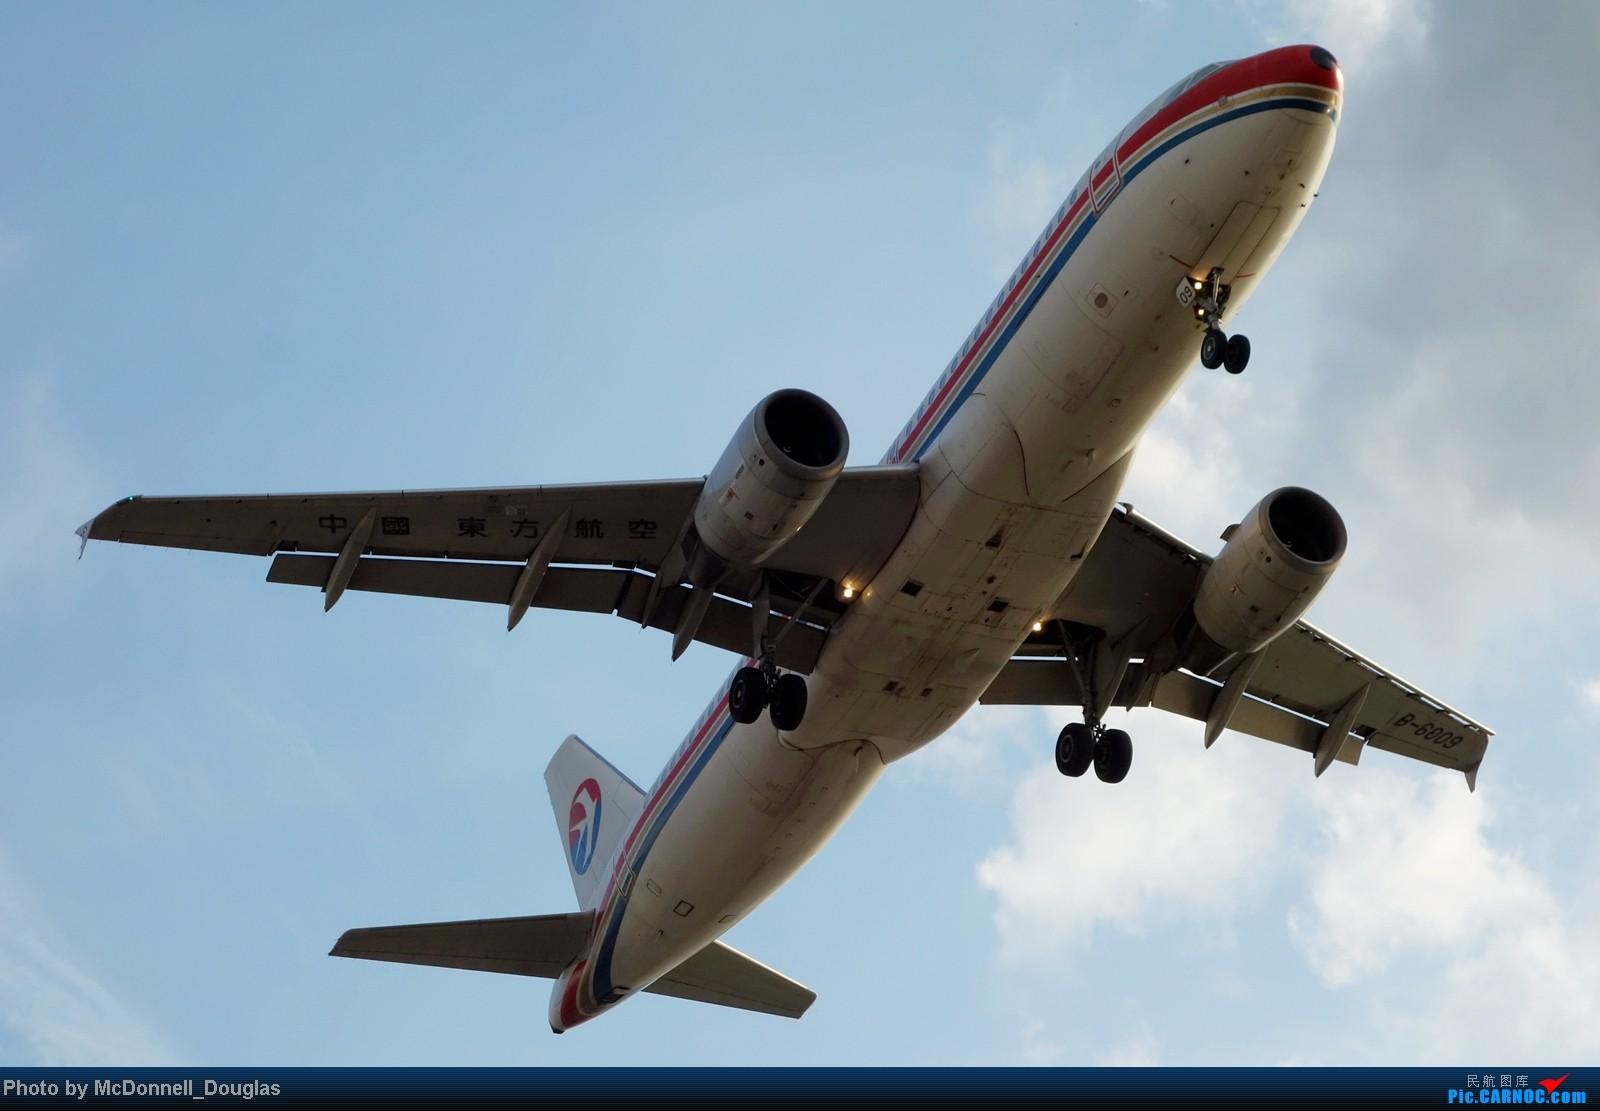 Re:[原创]【上海飞友会】ZSSS杂图一组 AIRBUS A320-200 B-6009 中国上海虹桥机场